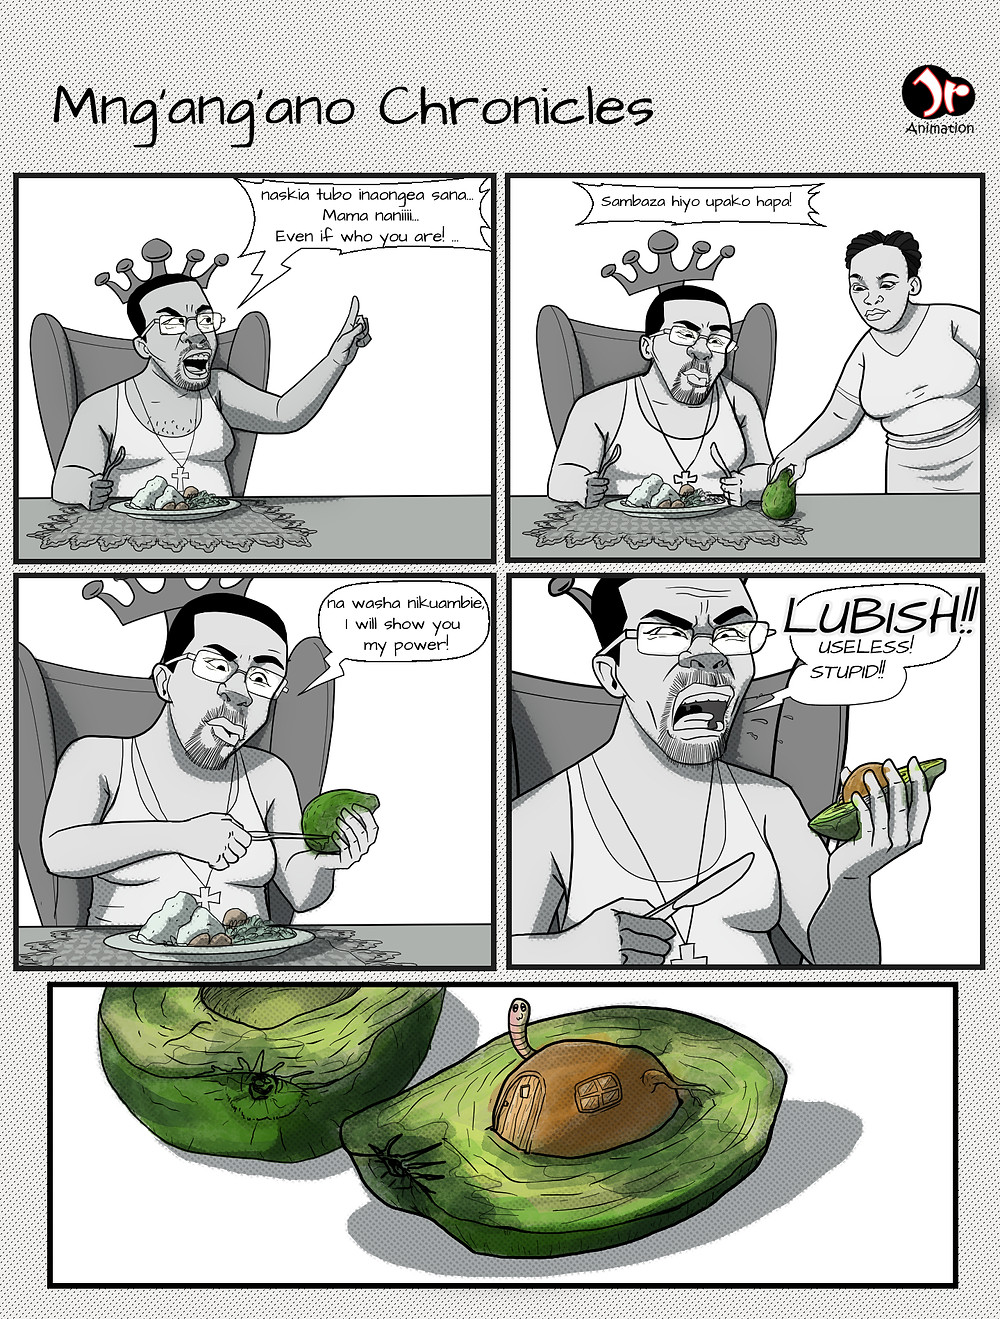 Labish comic strip